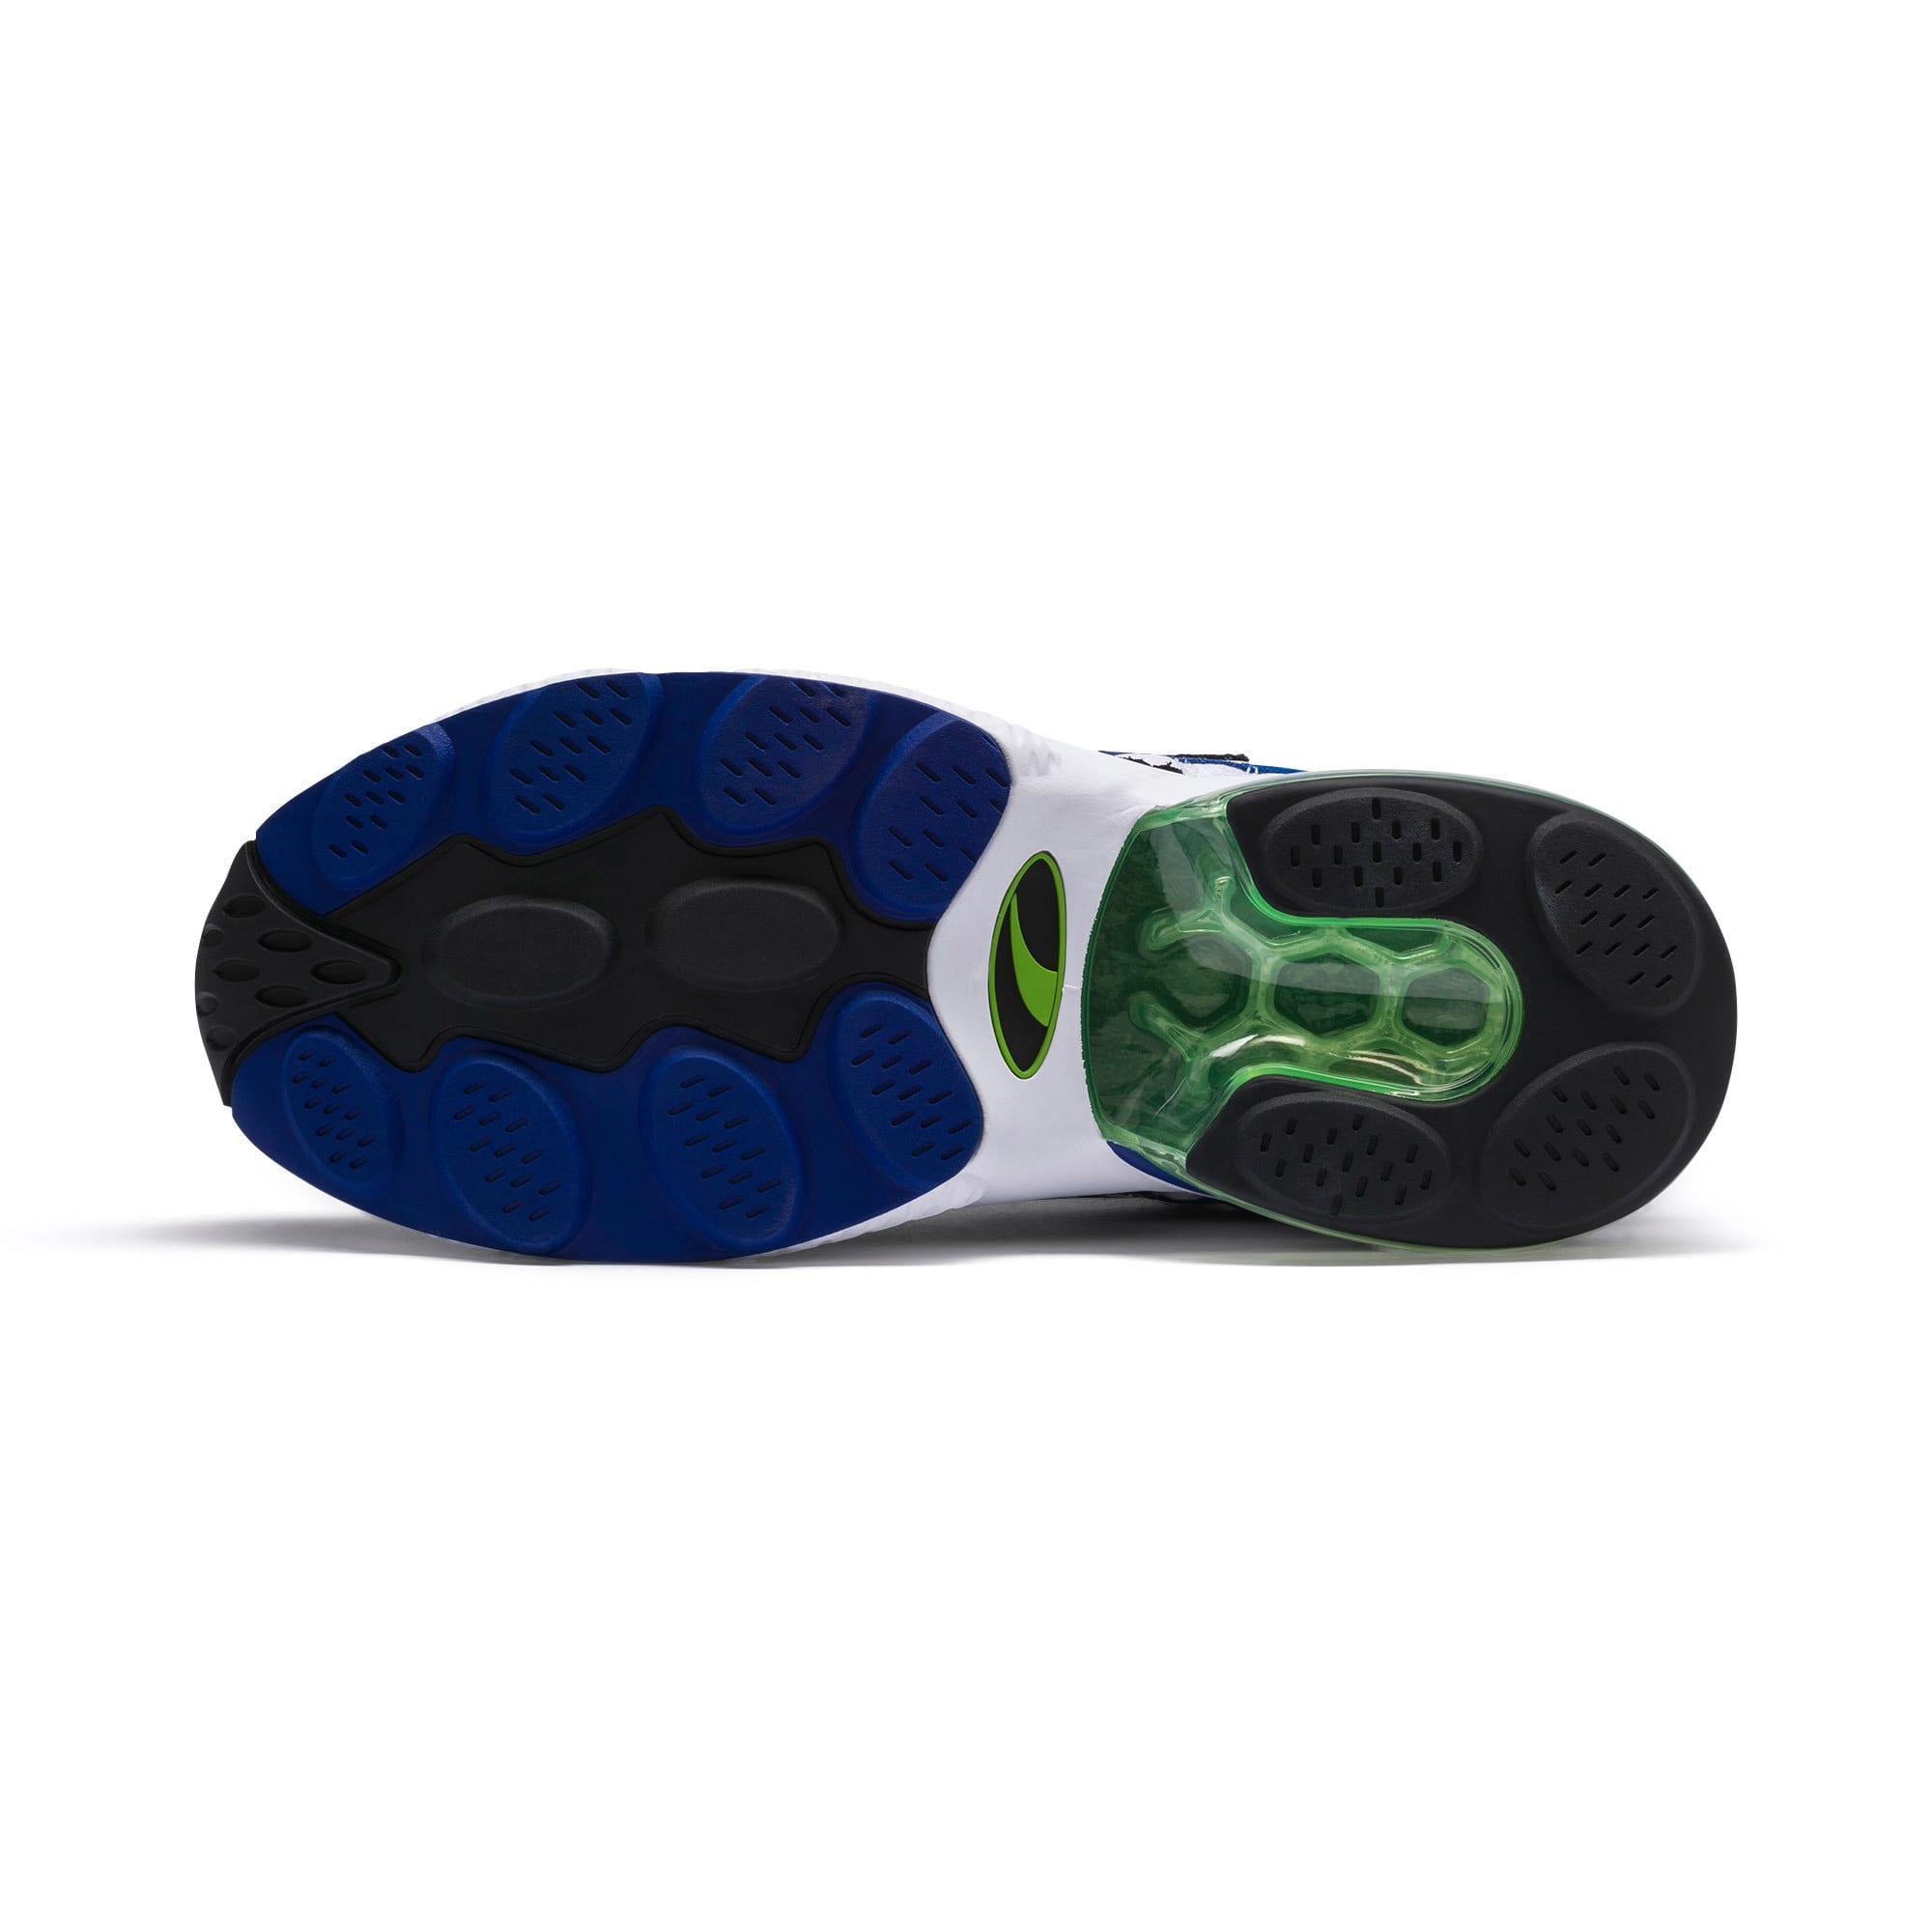 Thumbnail 6 of CELL Venom Men's Sneakers, Puma White-Surf The Web, medium